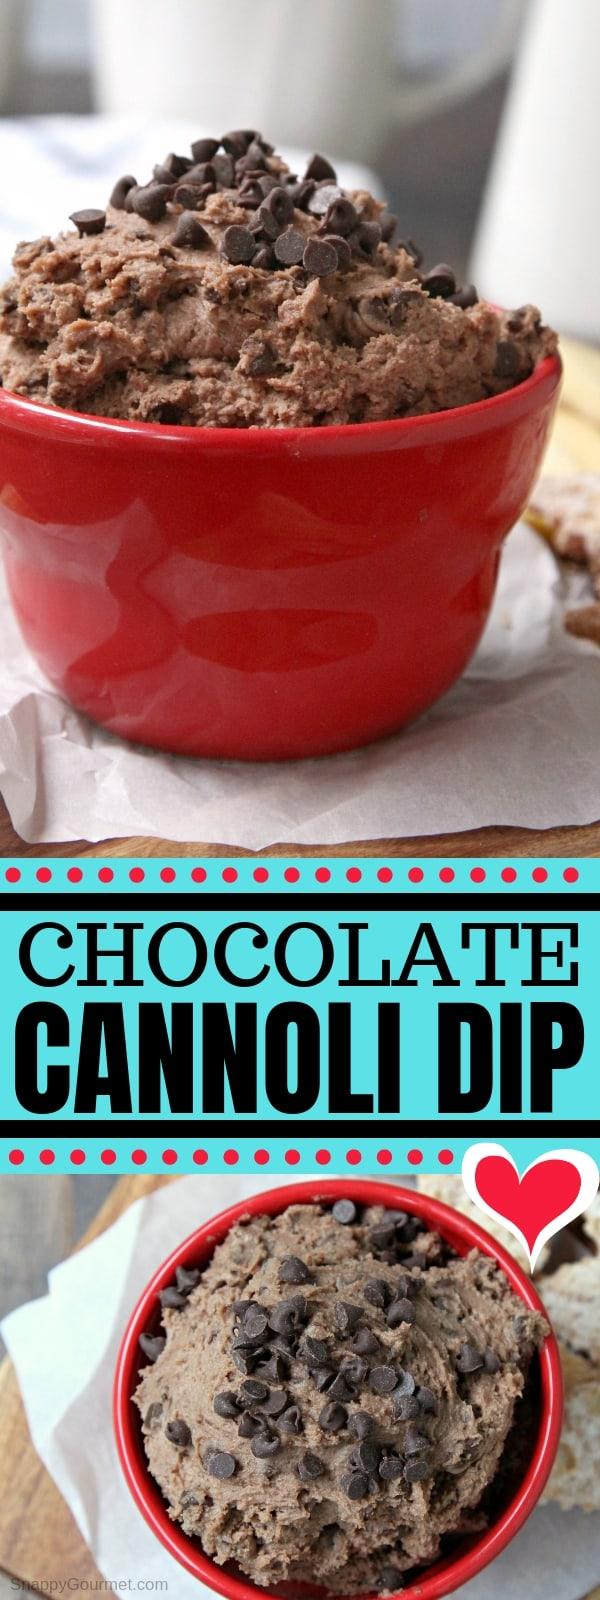 Chocolate Cannoli Dip - an easy homemade dessert dip